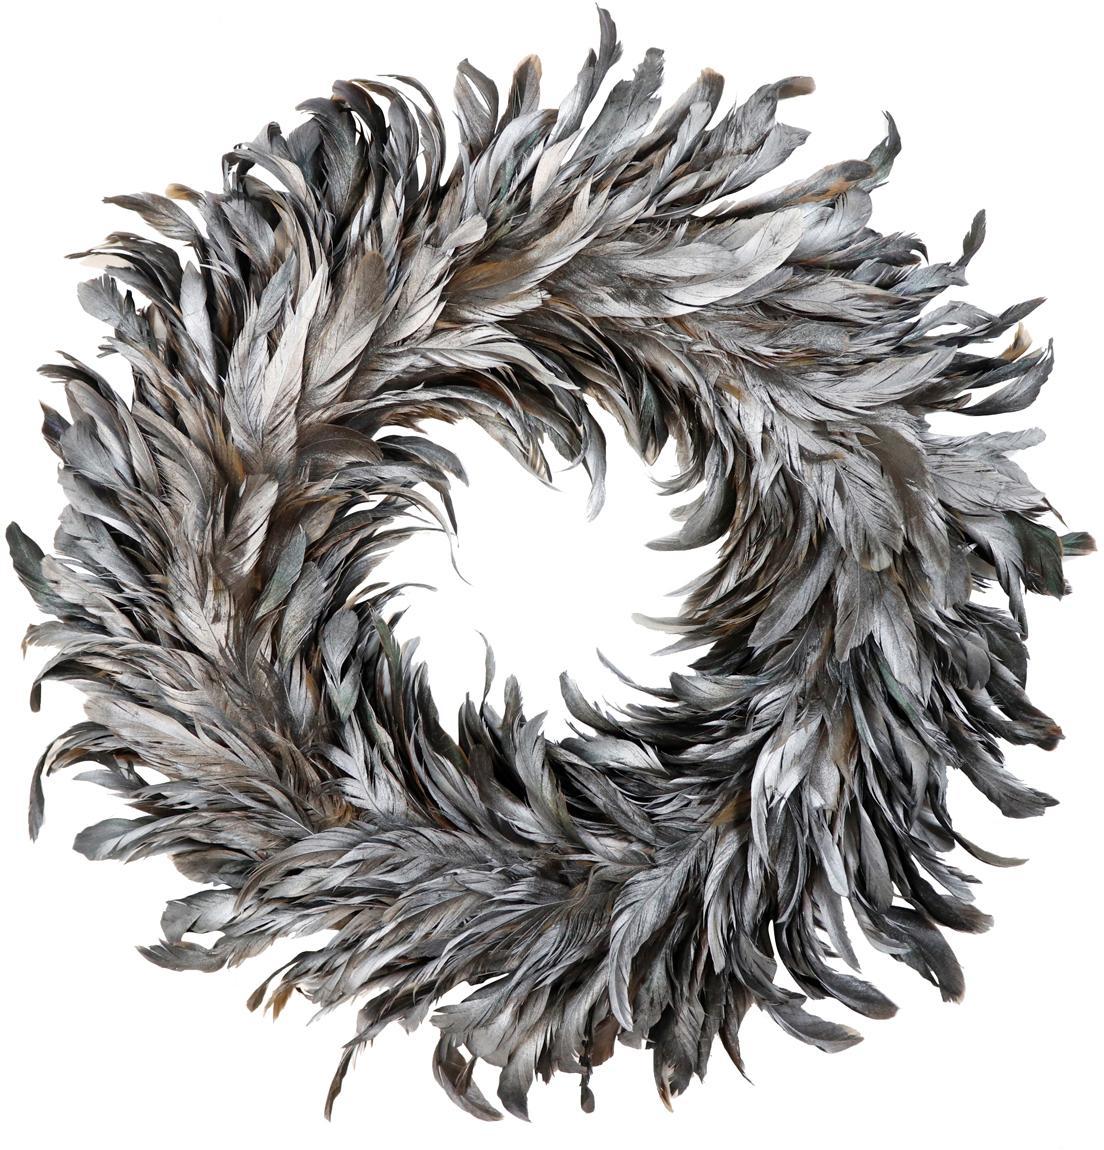 Ghirlanda di piume Argento, Piume, polistirolo, Grigio, Ø 37 cm